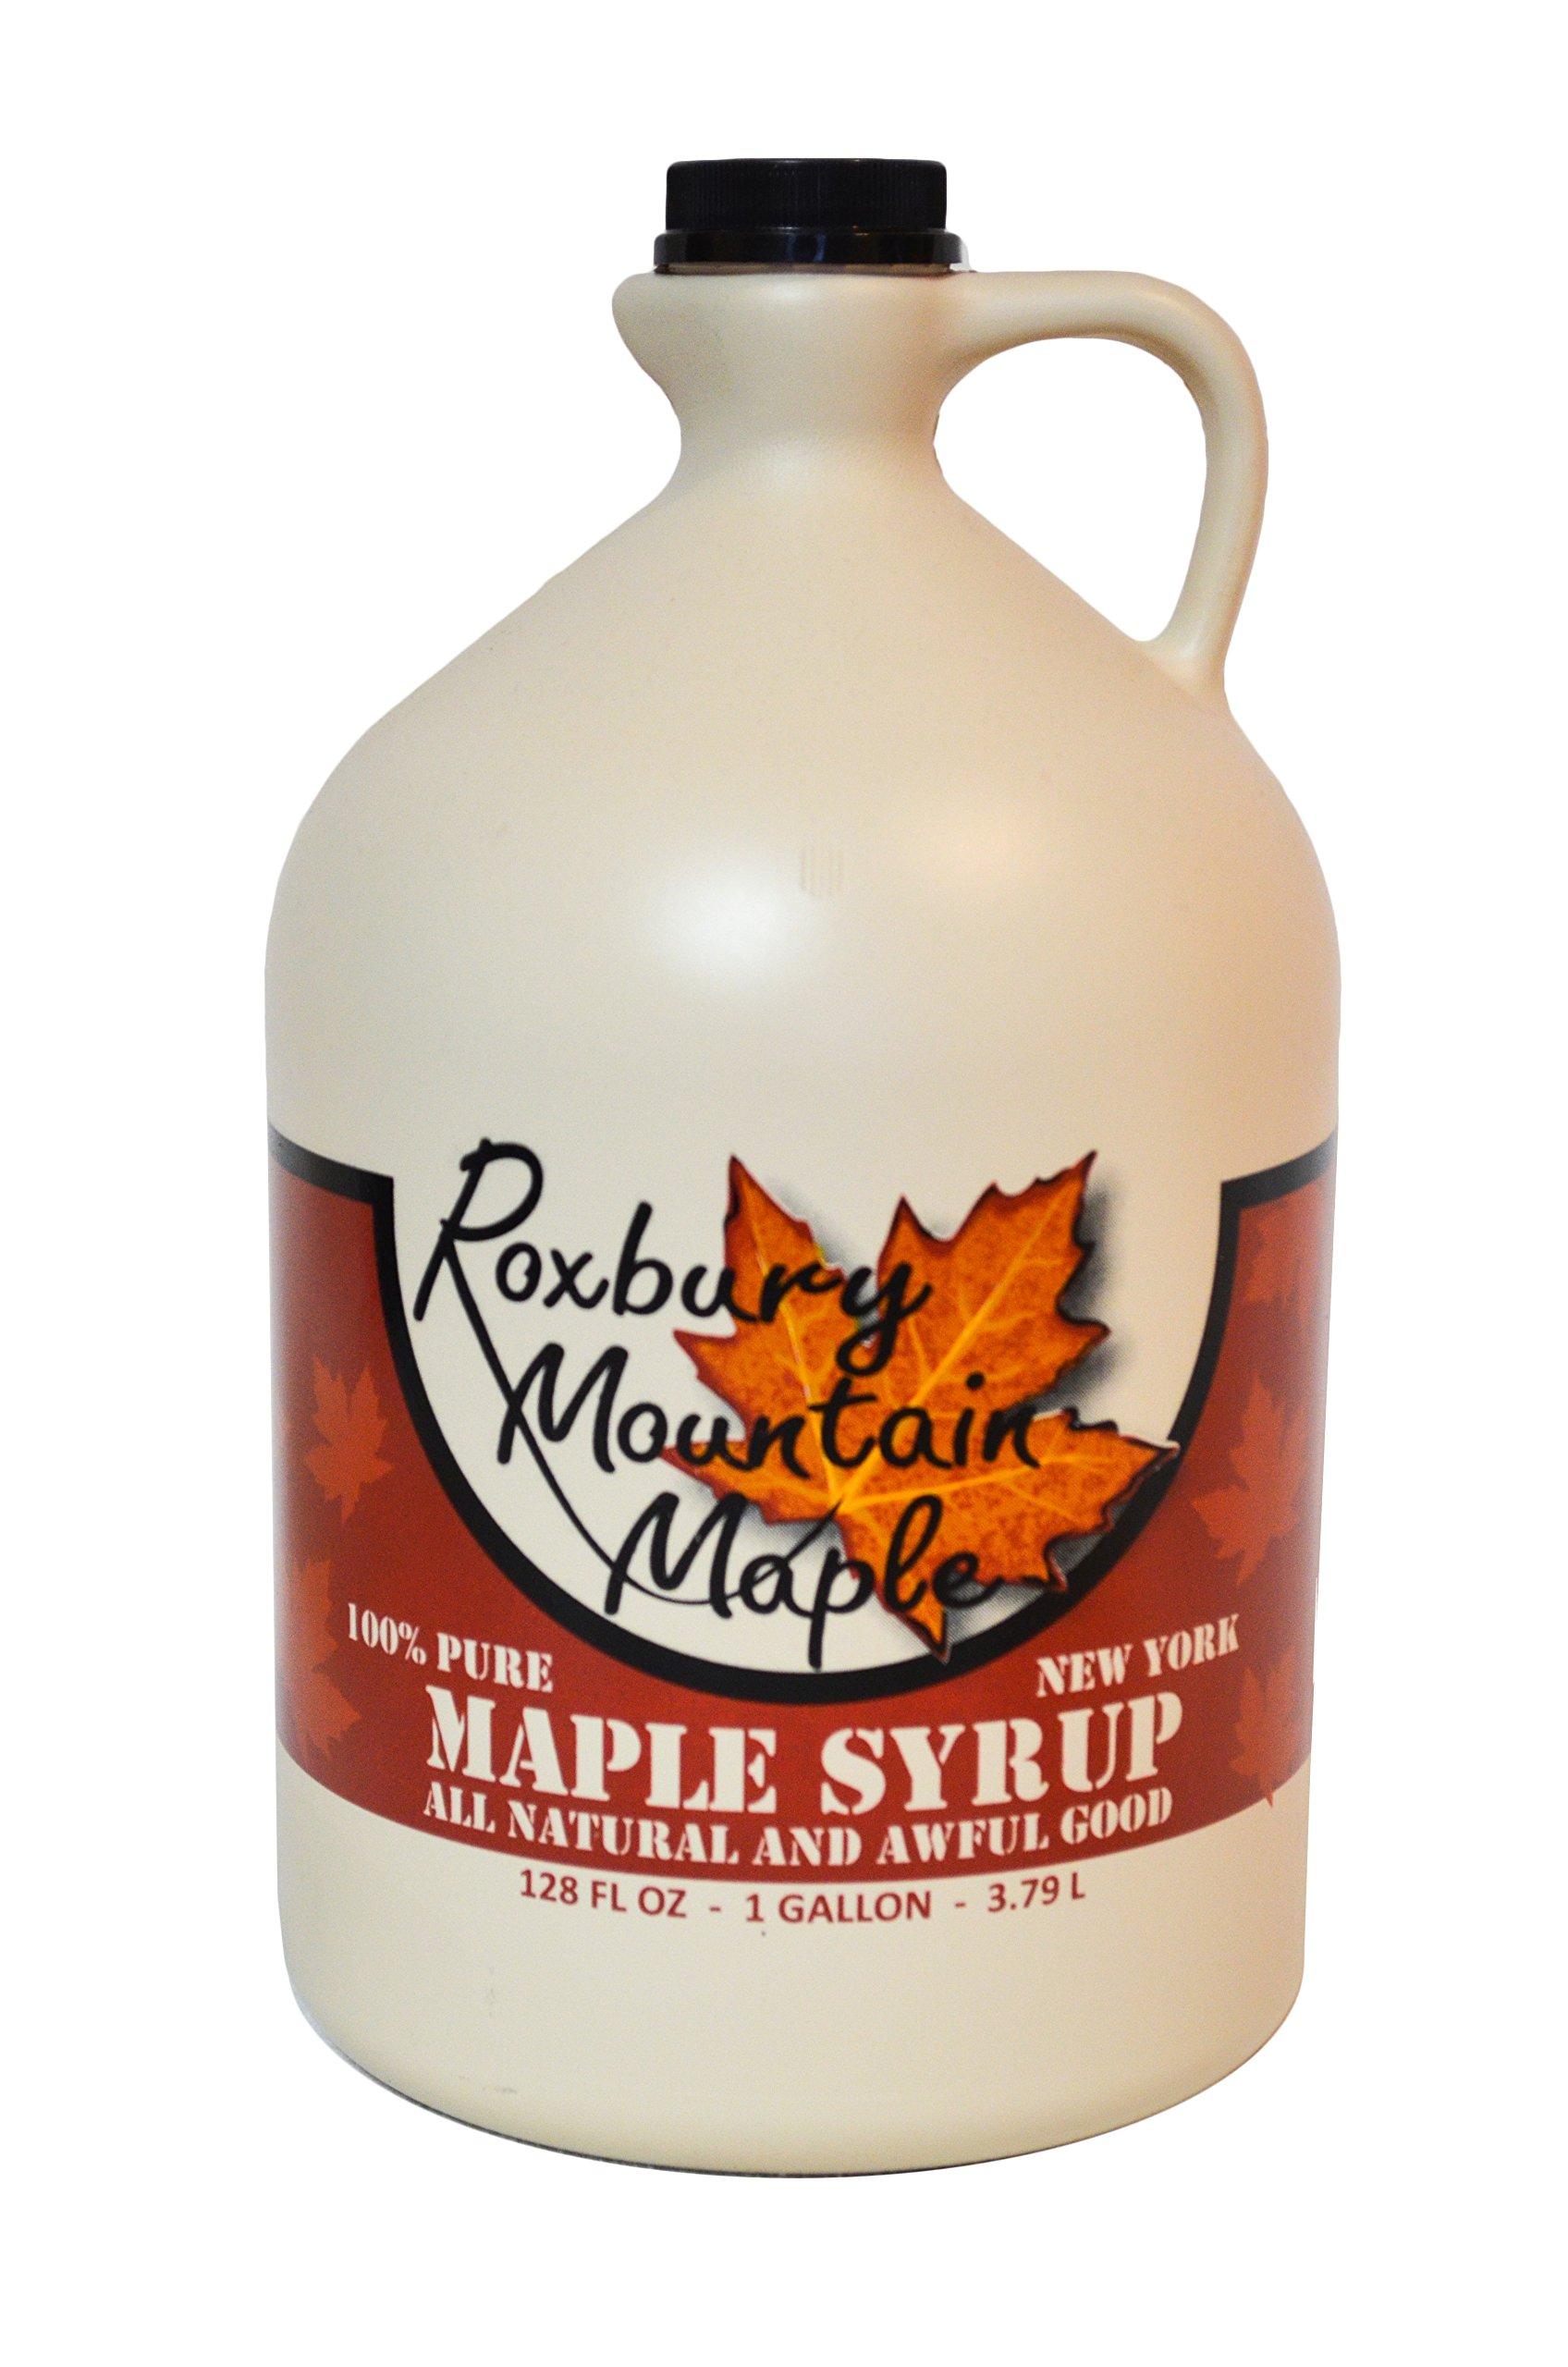 Pure Grade A Dark Maple Syrup, Roxbury Mountain Maple, 128 Ounces